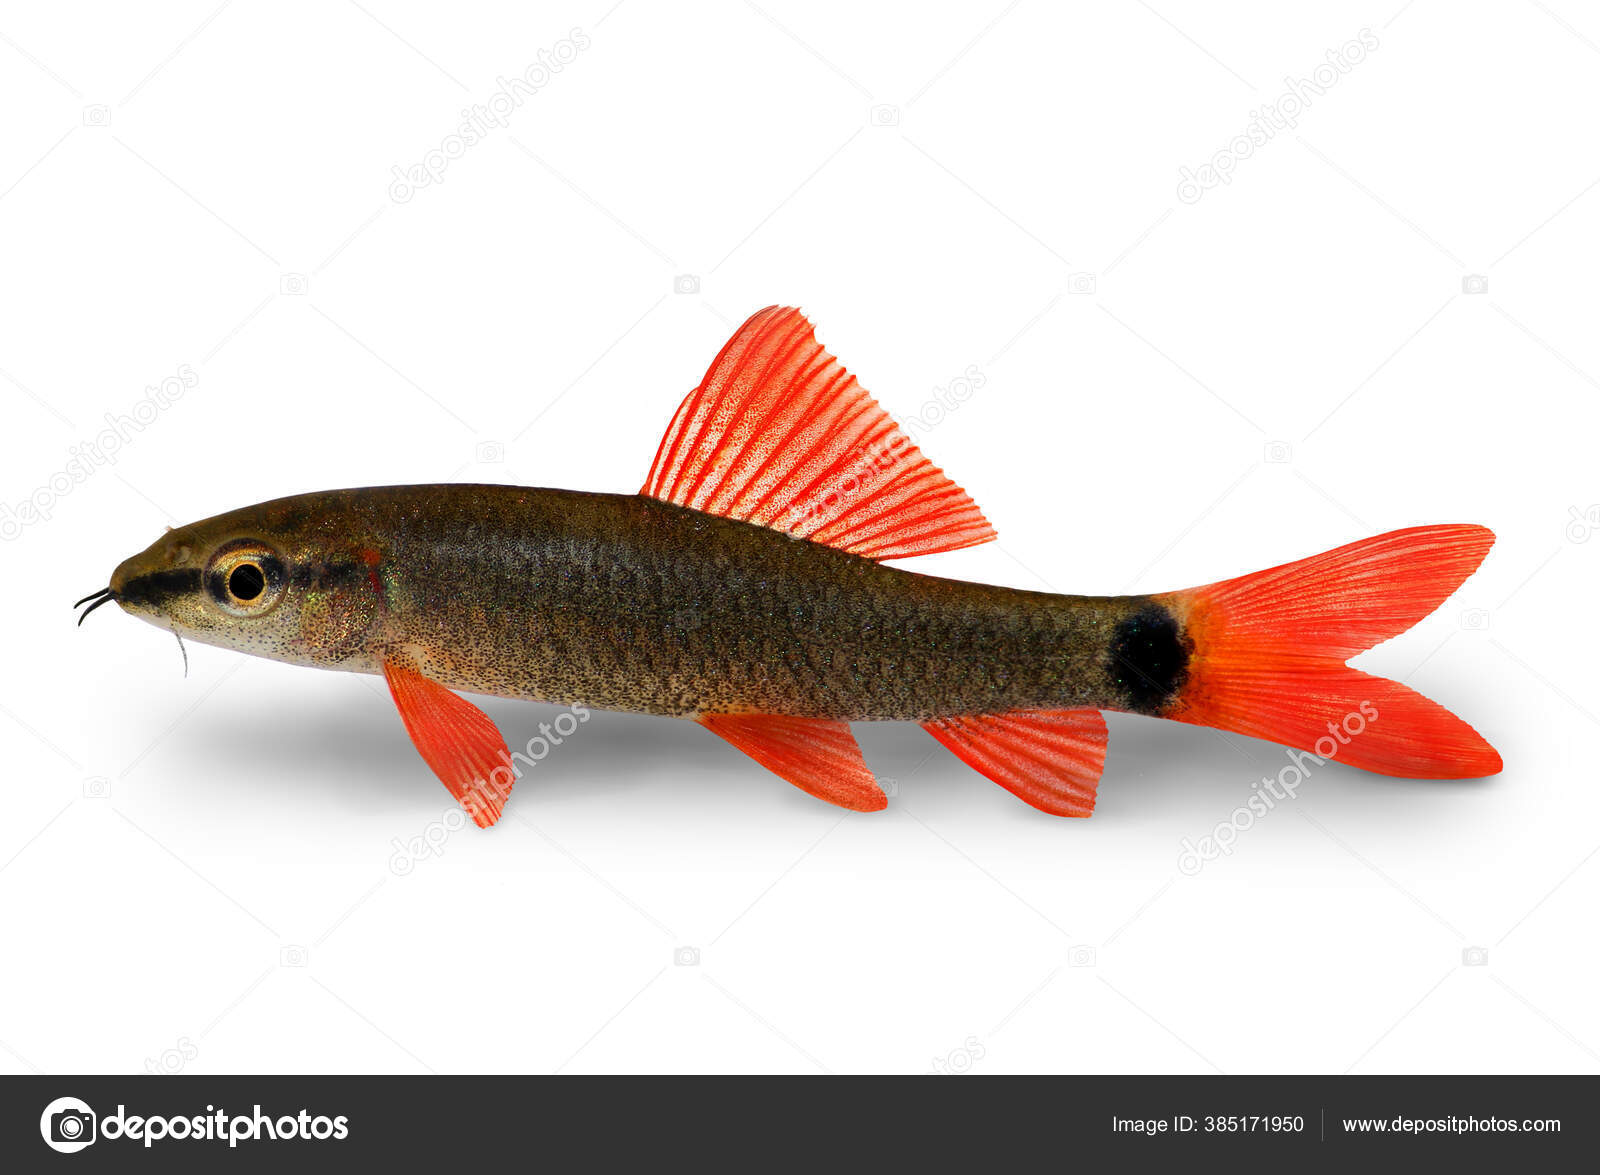 Rainbow Shark Catfish Epalzeorhynchos Frenatum Aquarium Fish Isolated White Stock Photo C Mirkor410 385171950